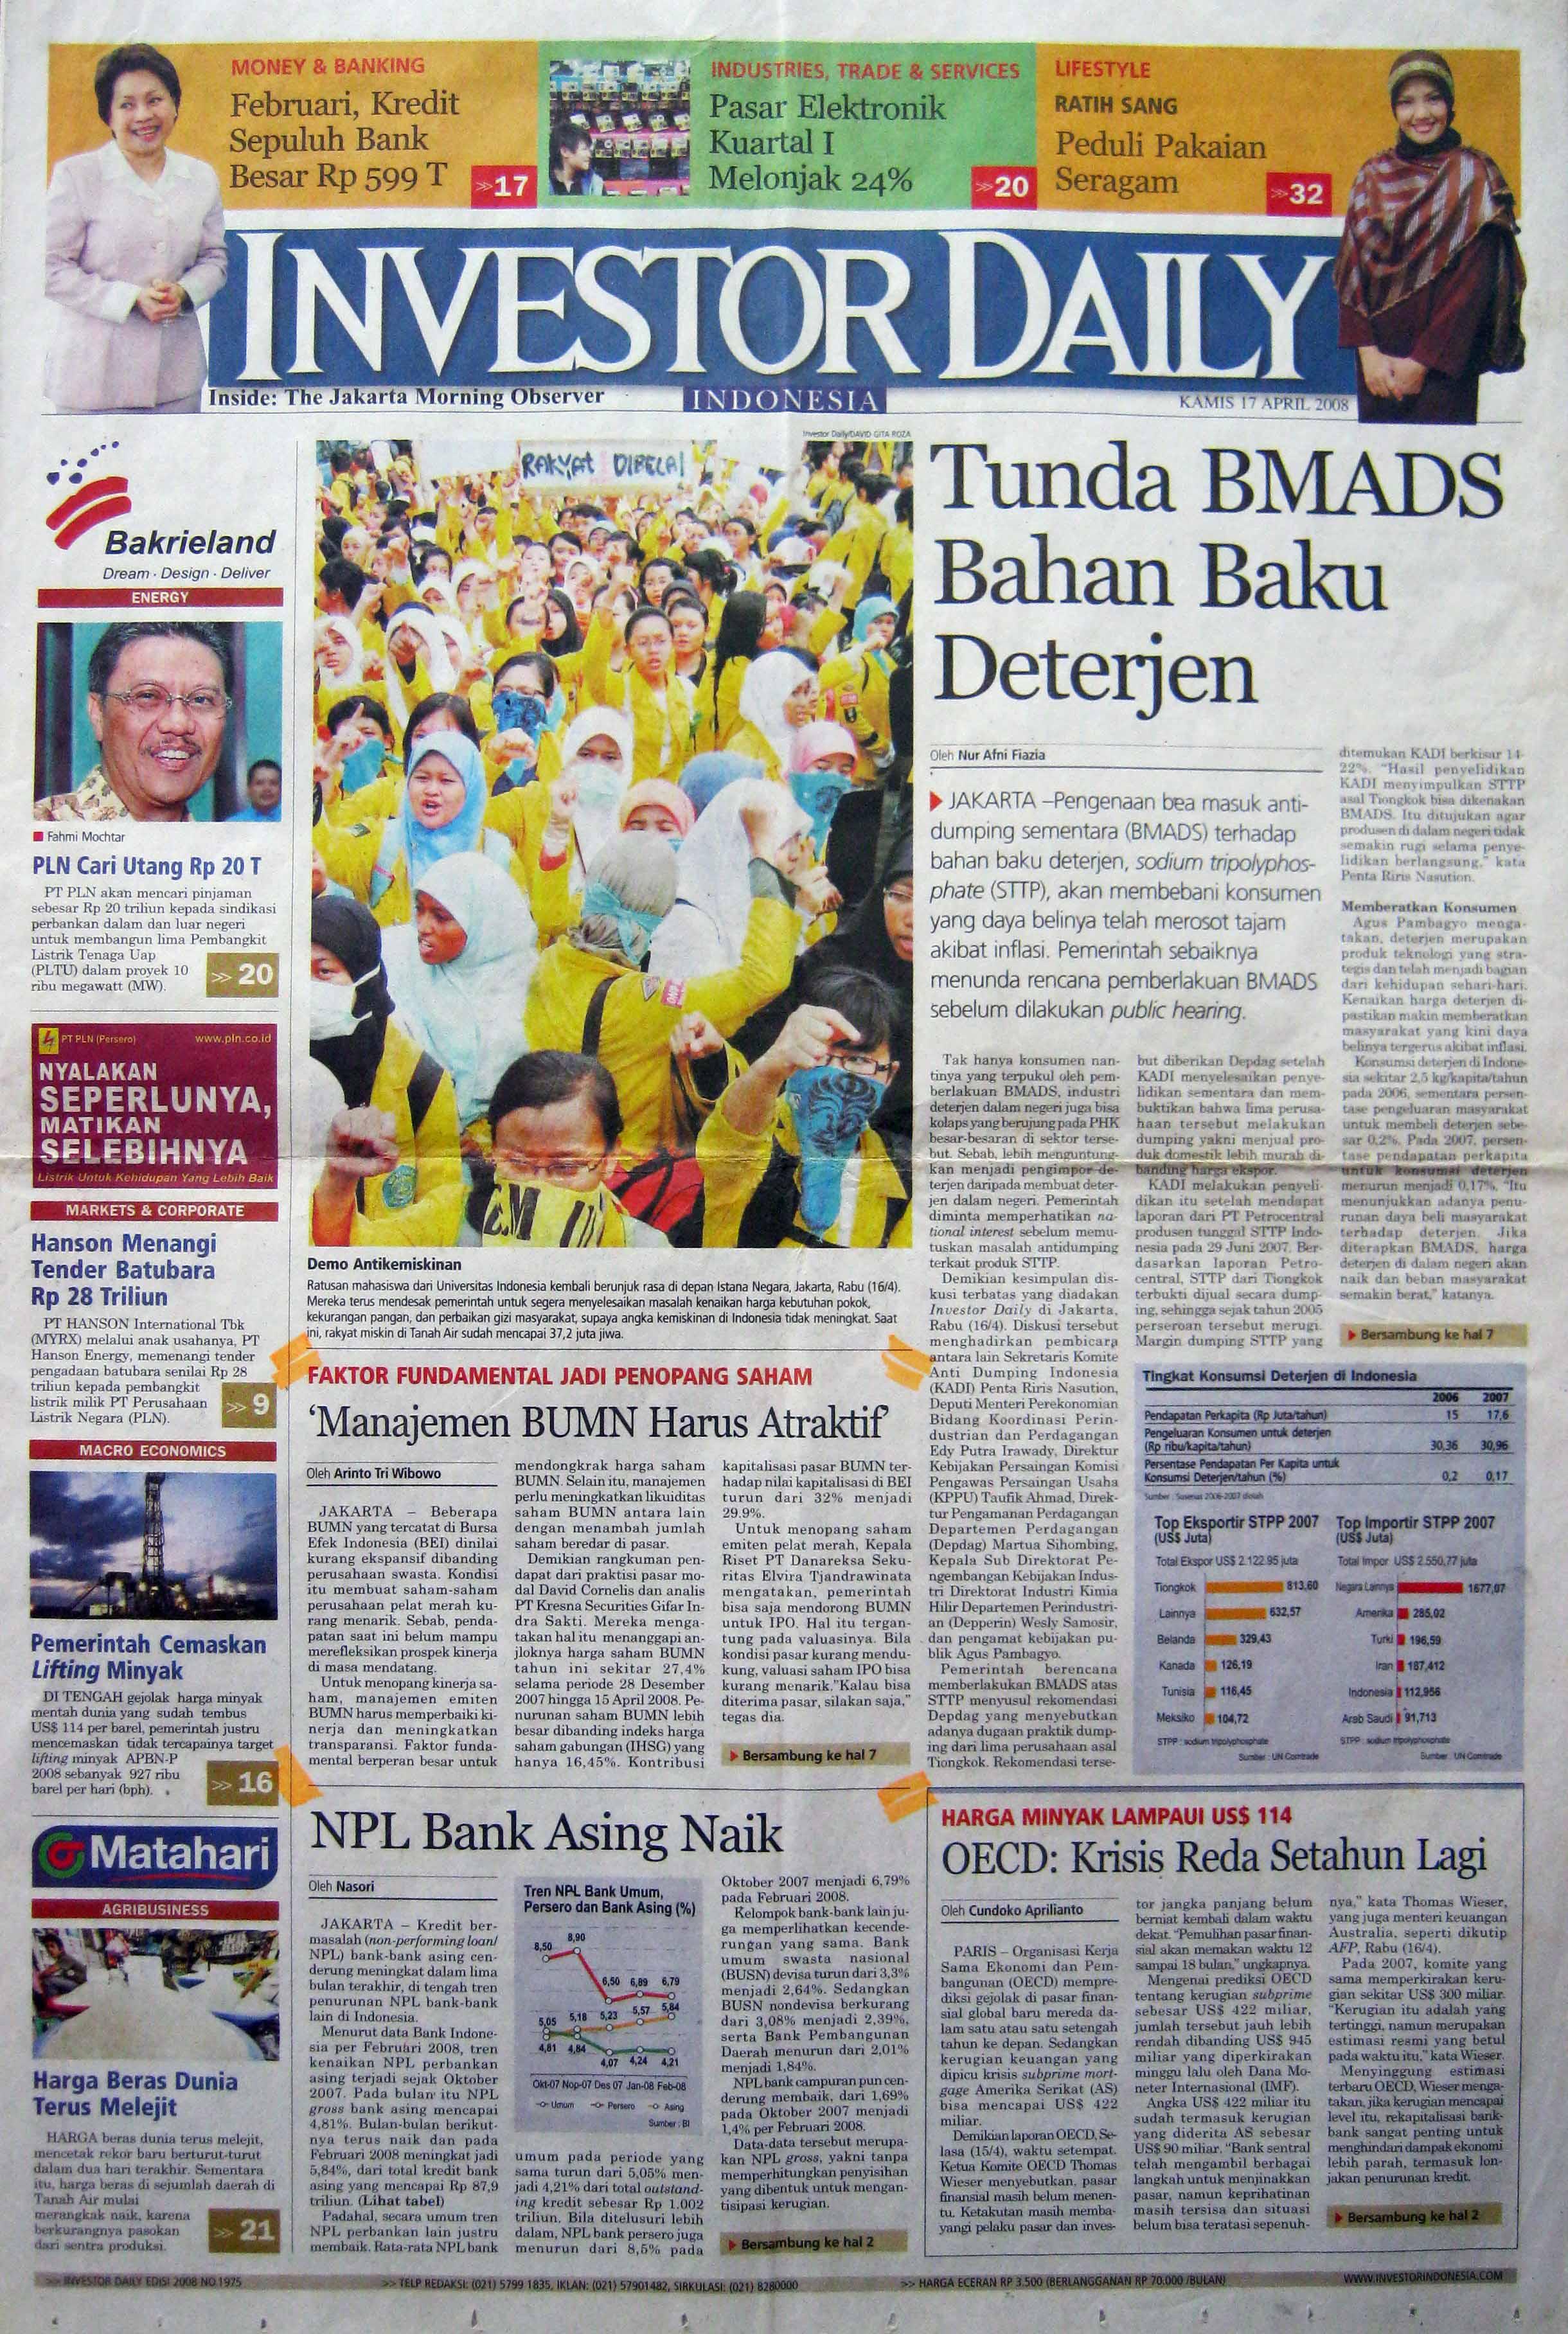 24. 17 April 2008 - Manajemen BUMN Harus Atraktif